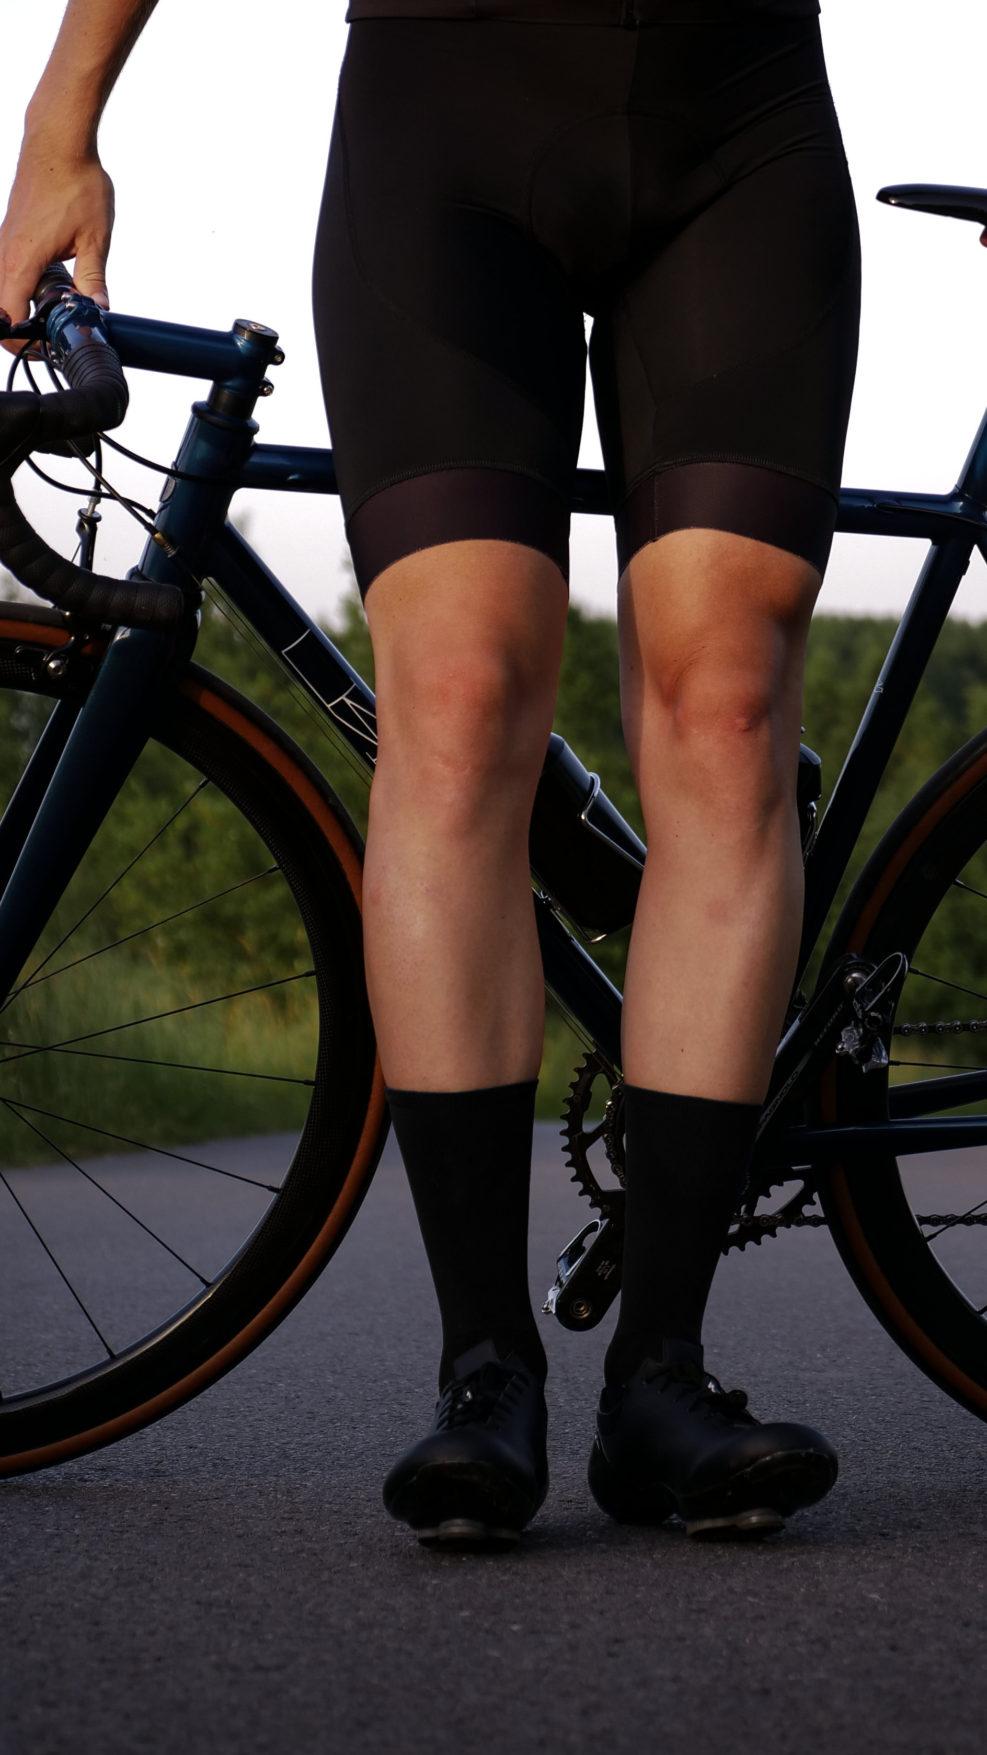 black cycling socks